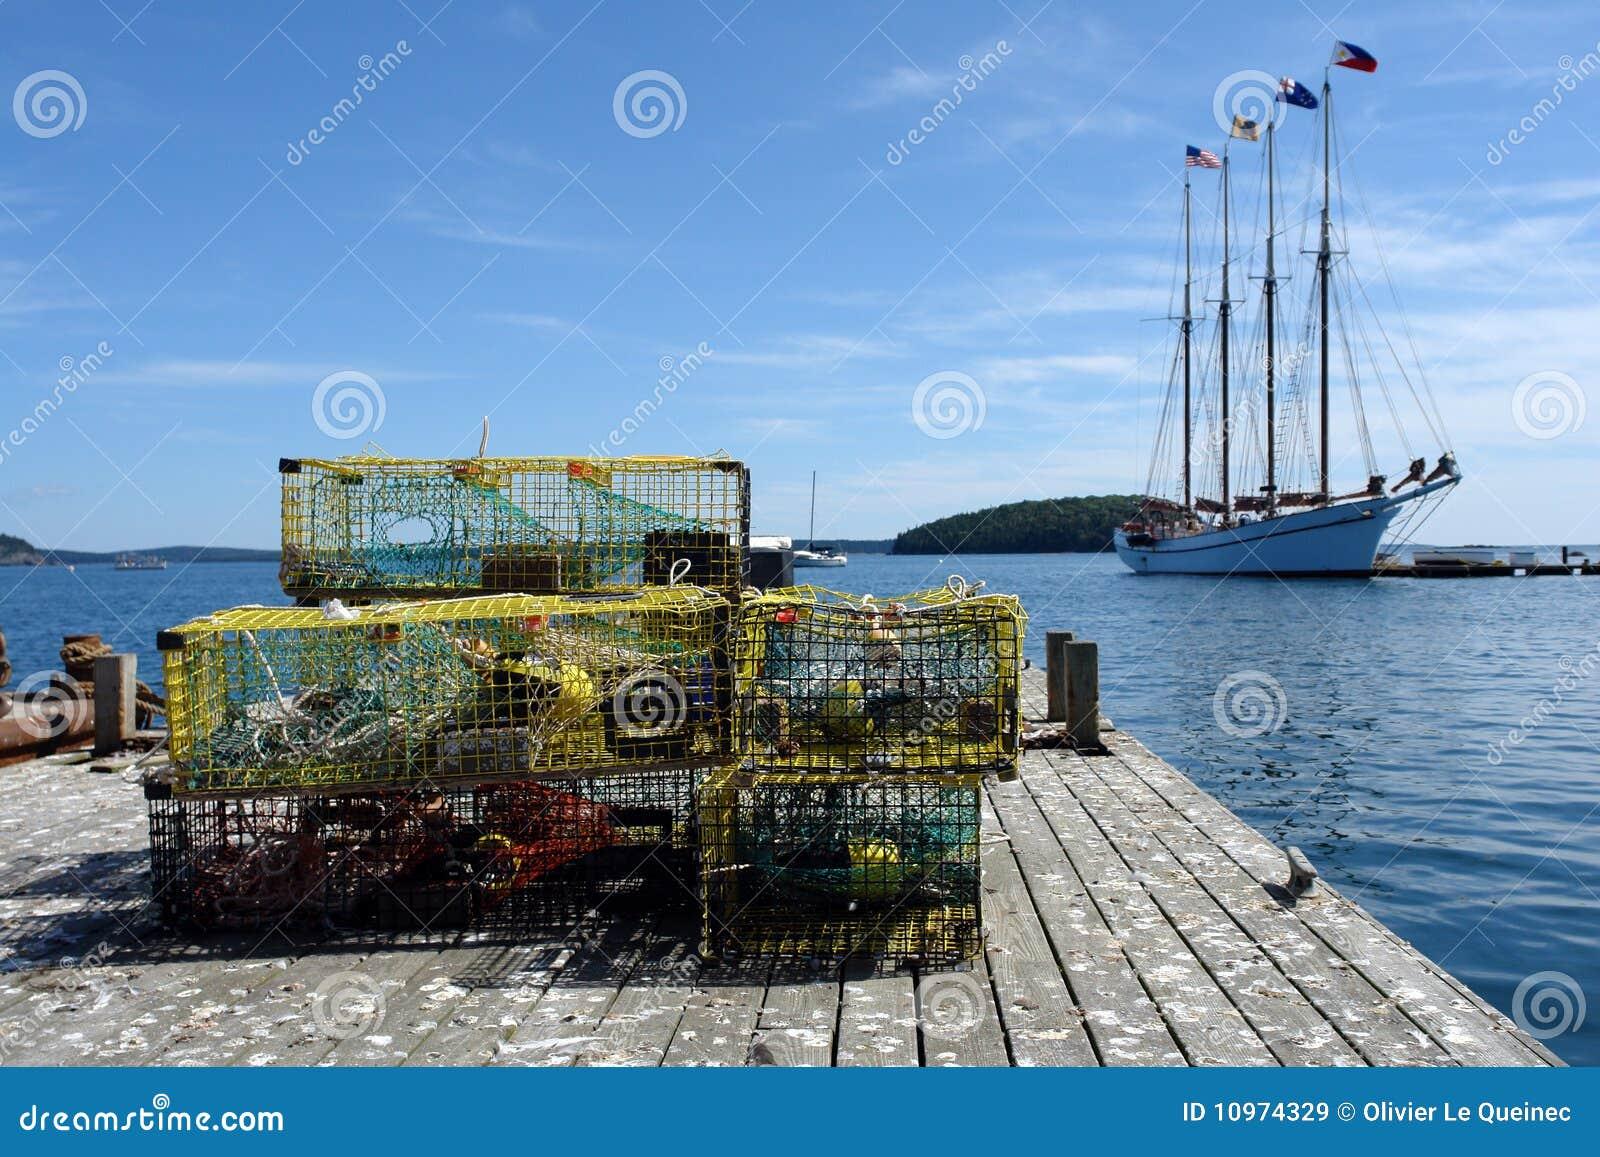 NET-MENDING OFF THE COAST OF MAINE FISHING BOATS SHIPS NAUTICAL